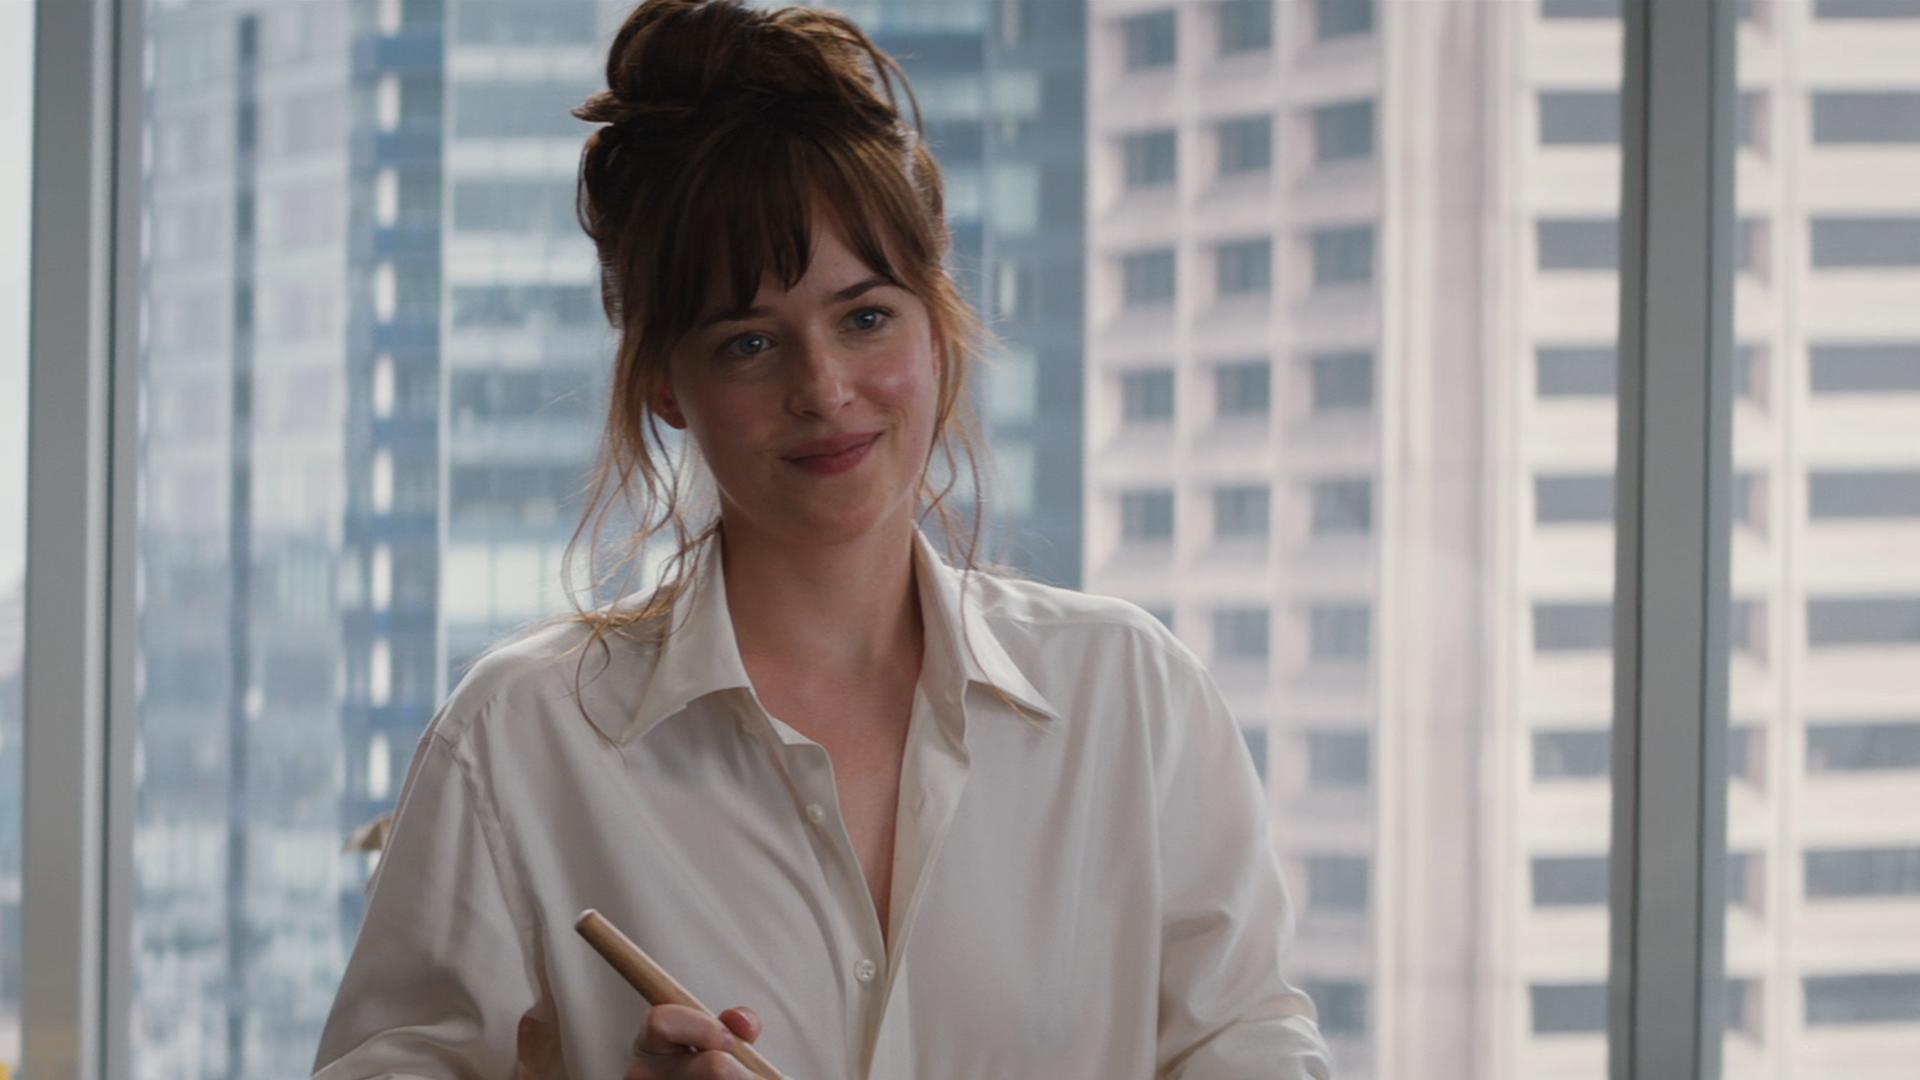 Watch Full Movie 50 Shades Of Grey